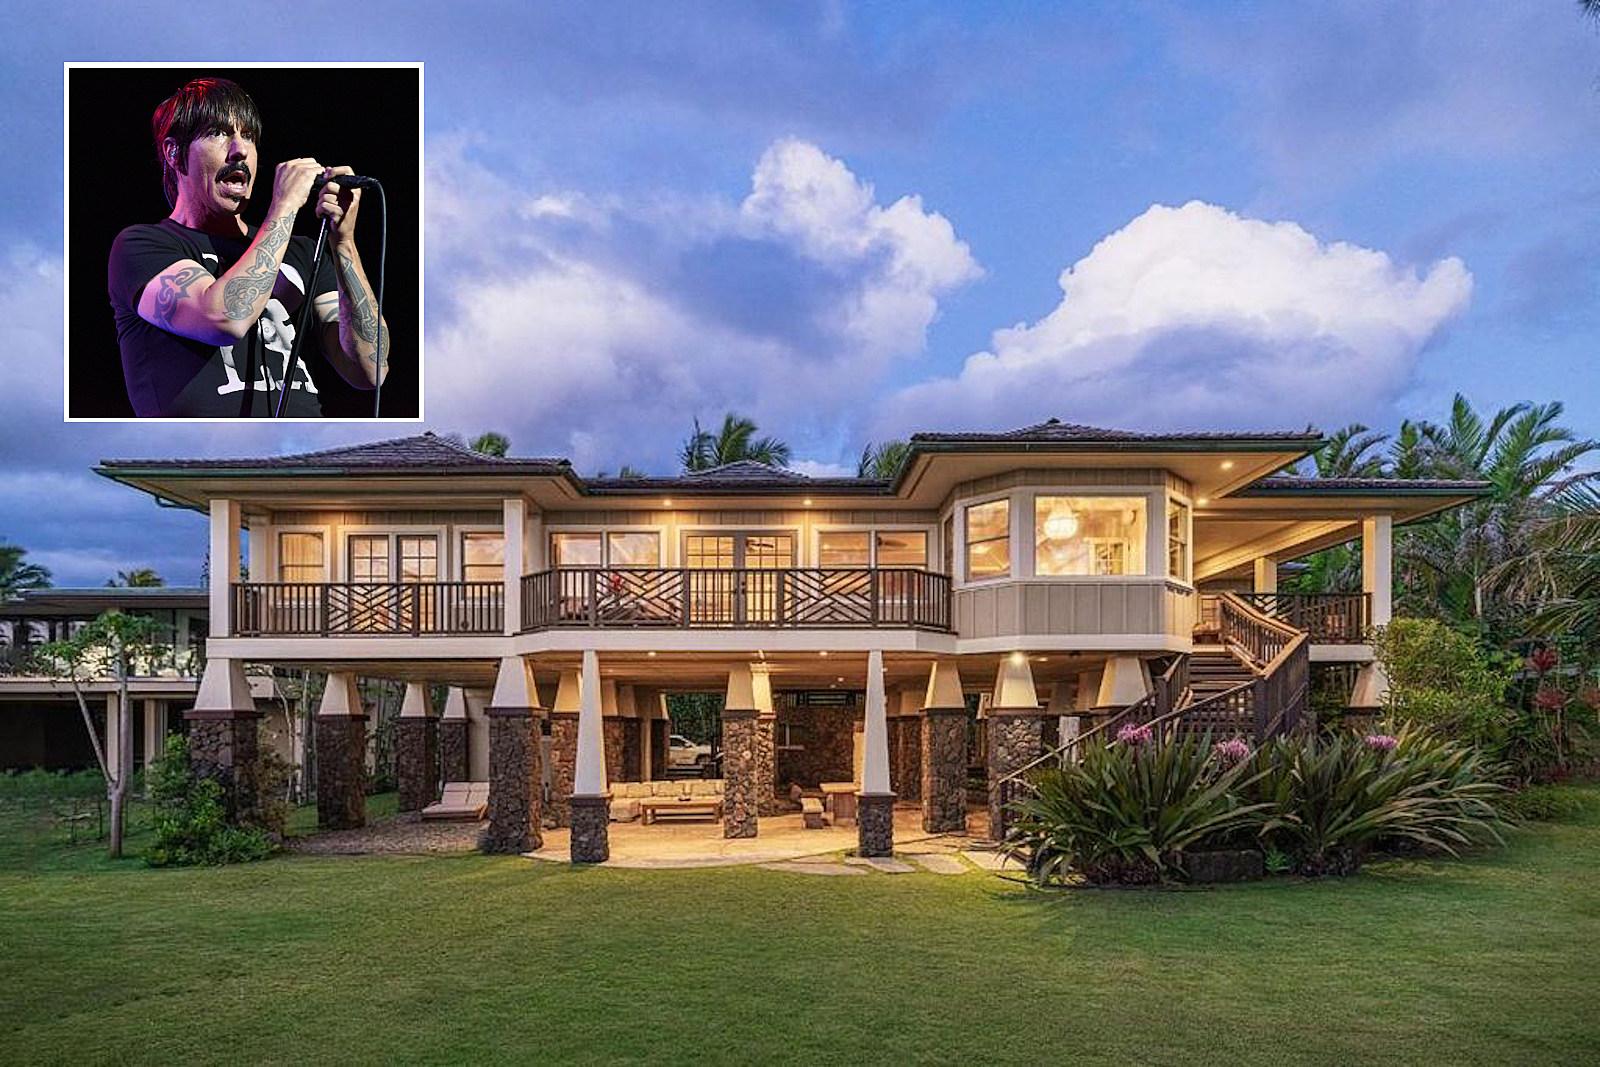 Anthony Kiedis Selling 'Truly Beautiful' Hawaiian Home for $10M